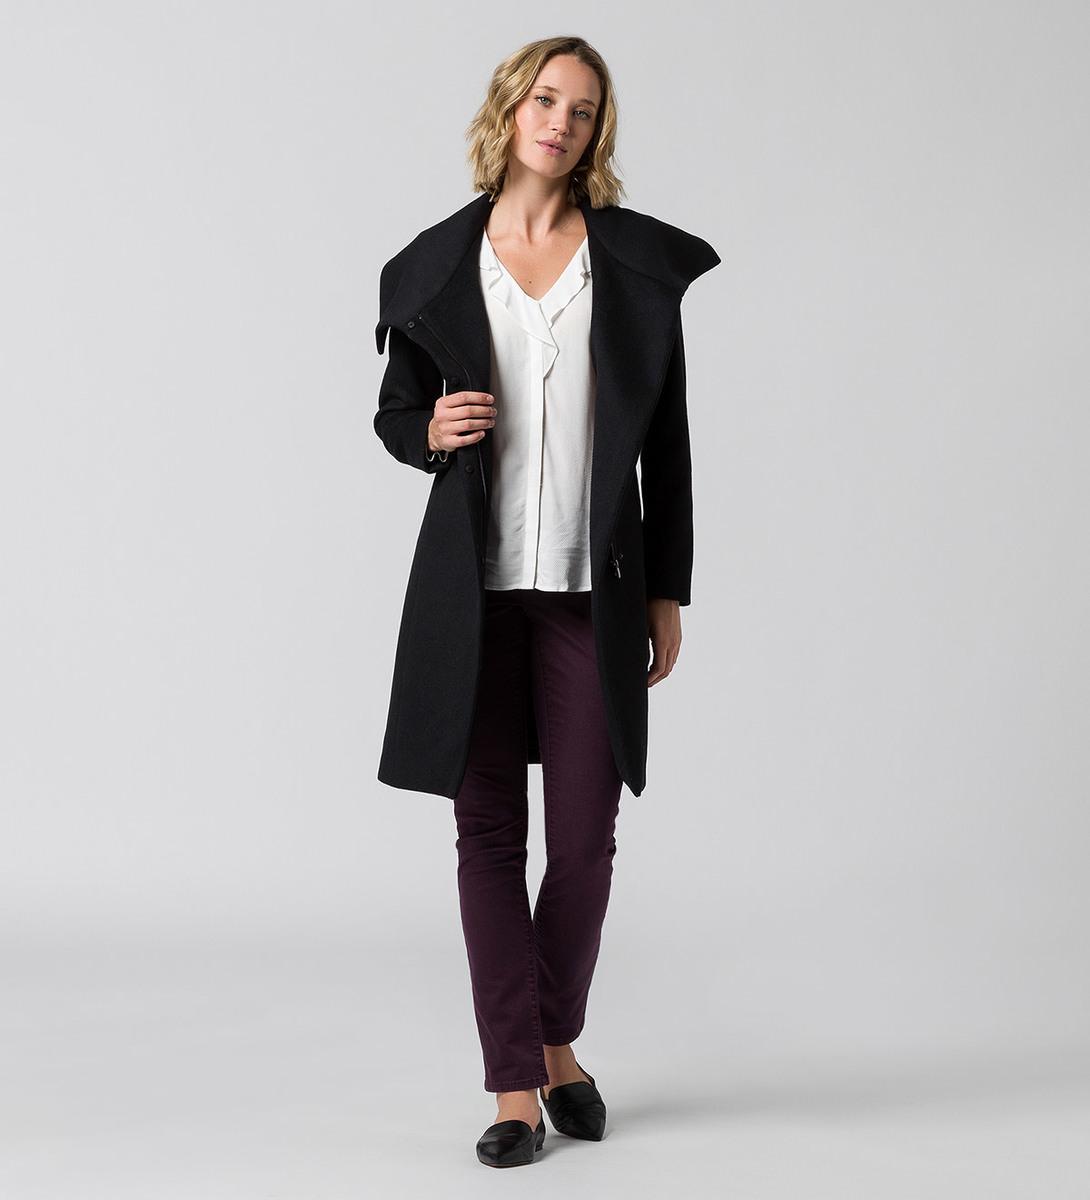 Mantel mit Wolle in black